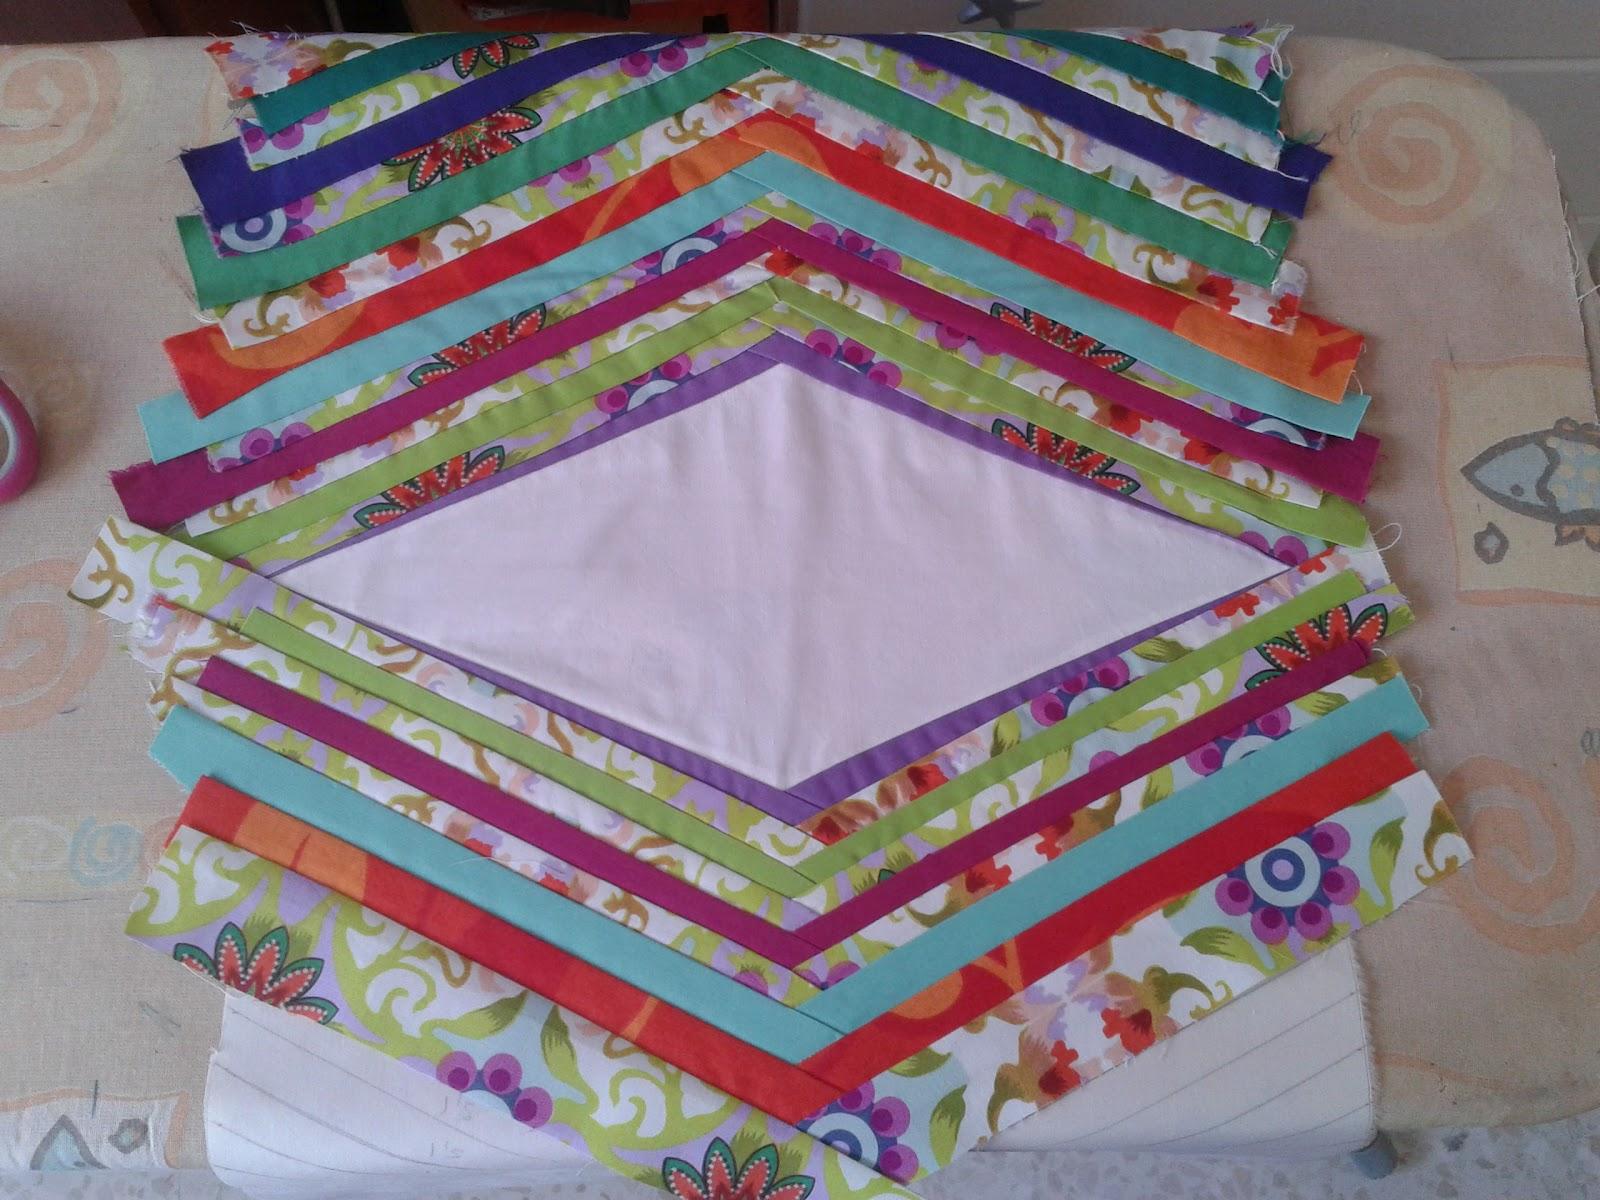 Macu divina mis tesoros camino de mesa patchwork - Camino mesa patchwork ...